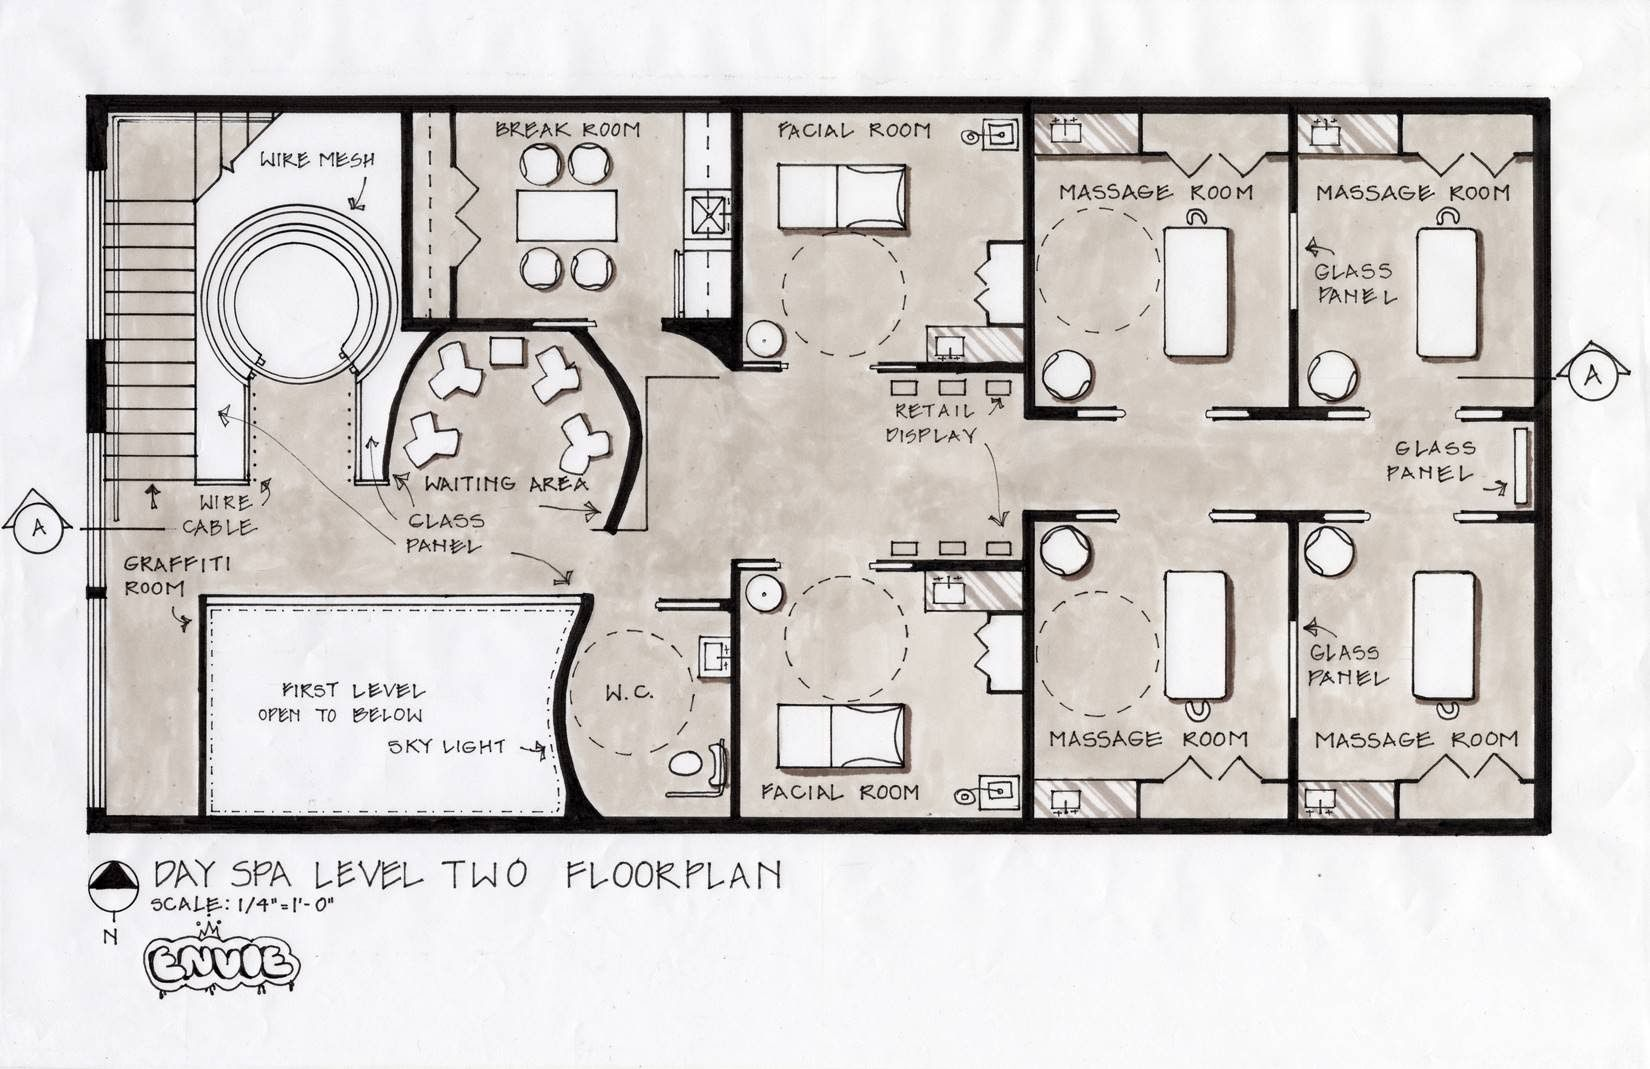 Day Spa Floor Plan Interior Plann Spa Floor